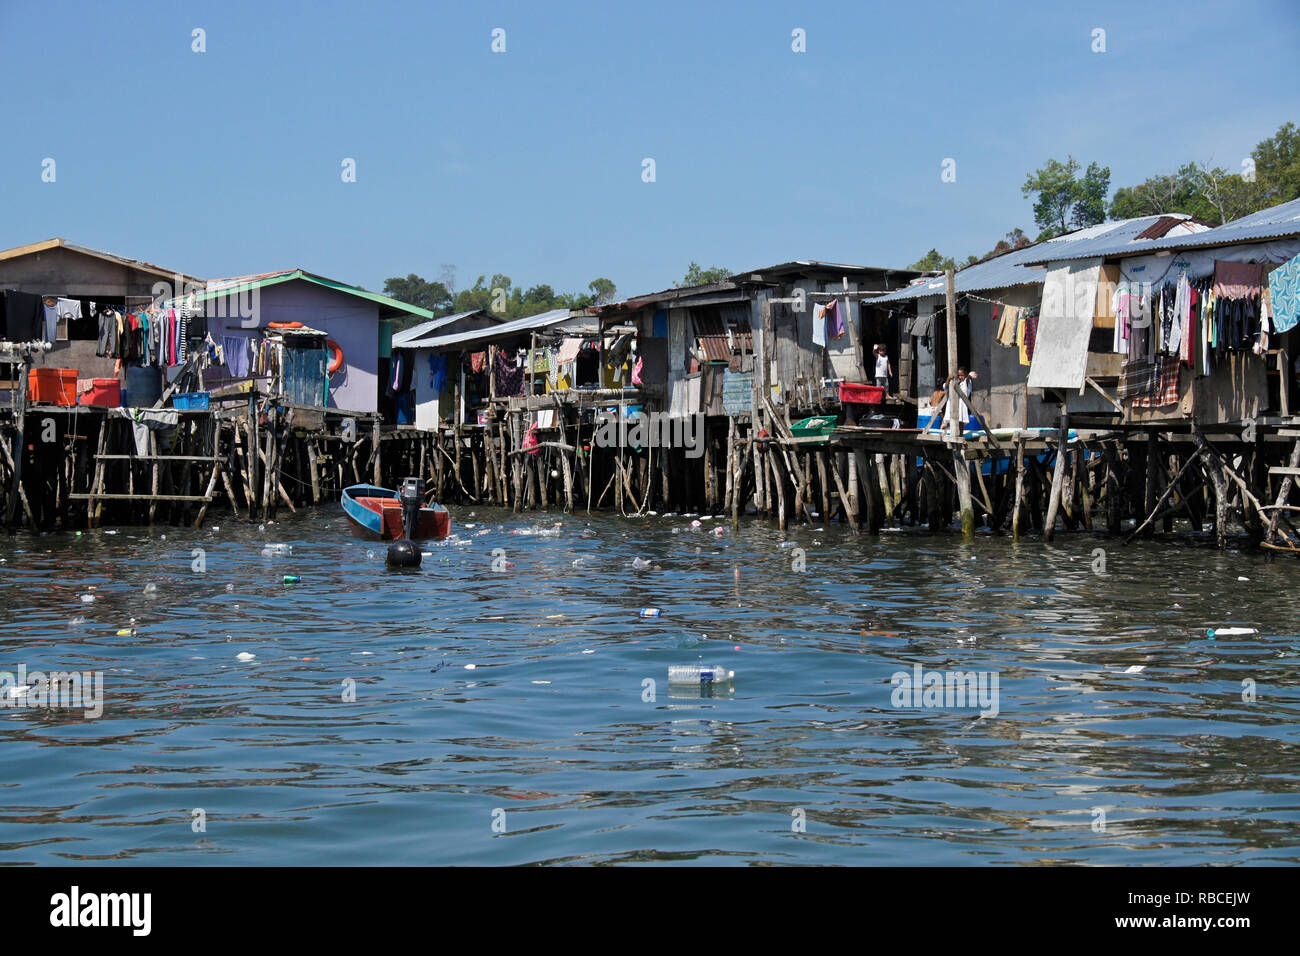 Stilt village in South China Sea near Kota Kinabalu, Sabah (Borneo), Malaysia - Stock Image